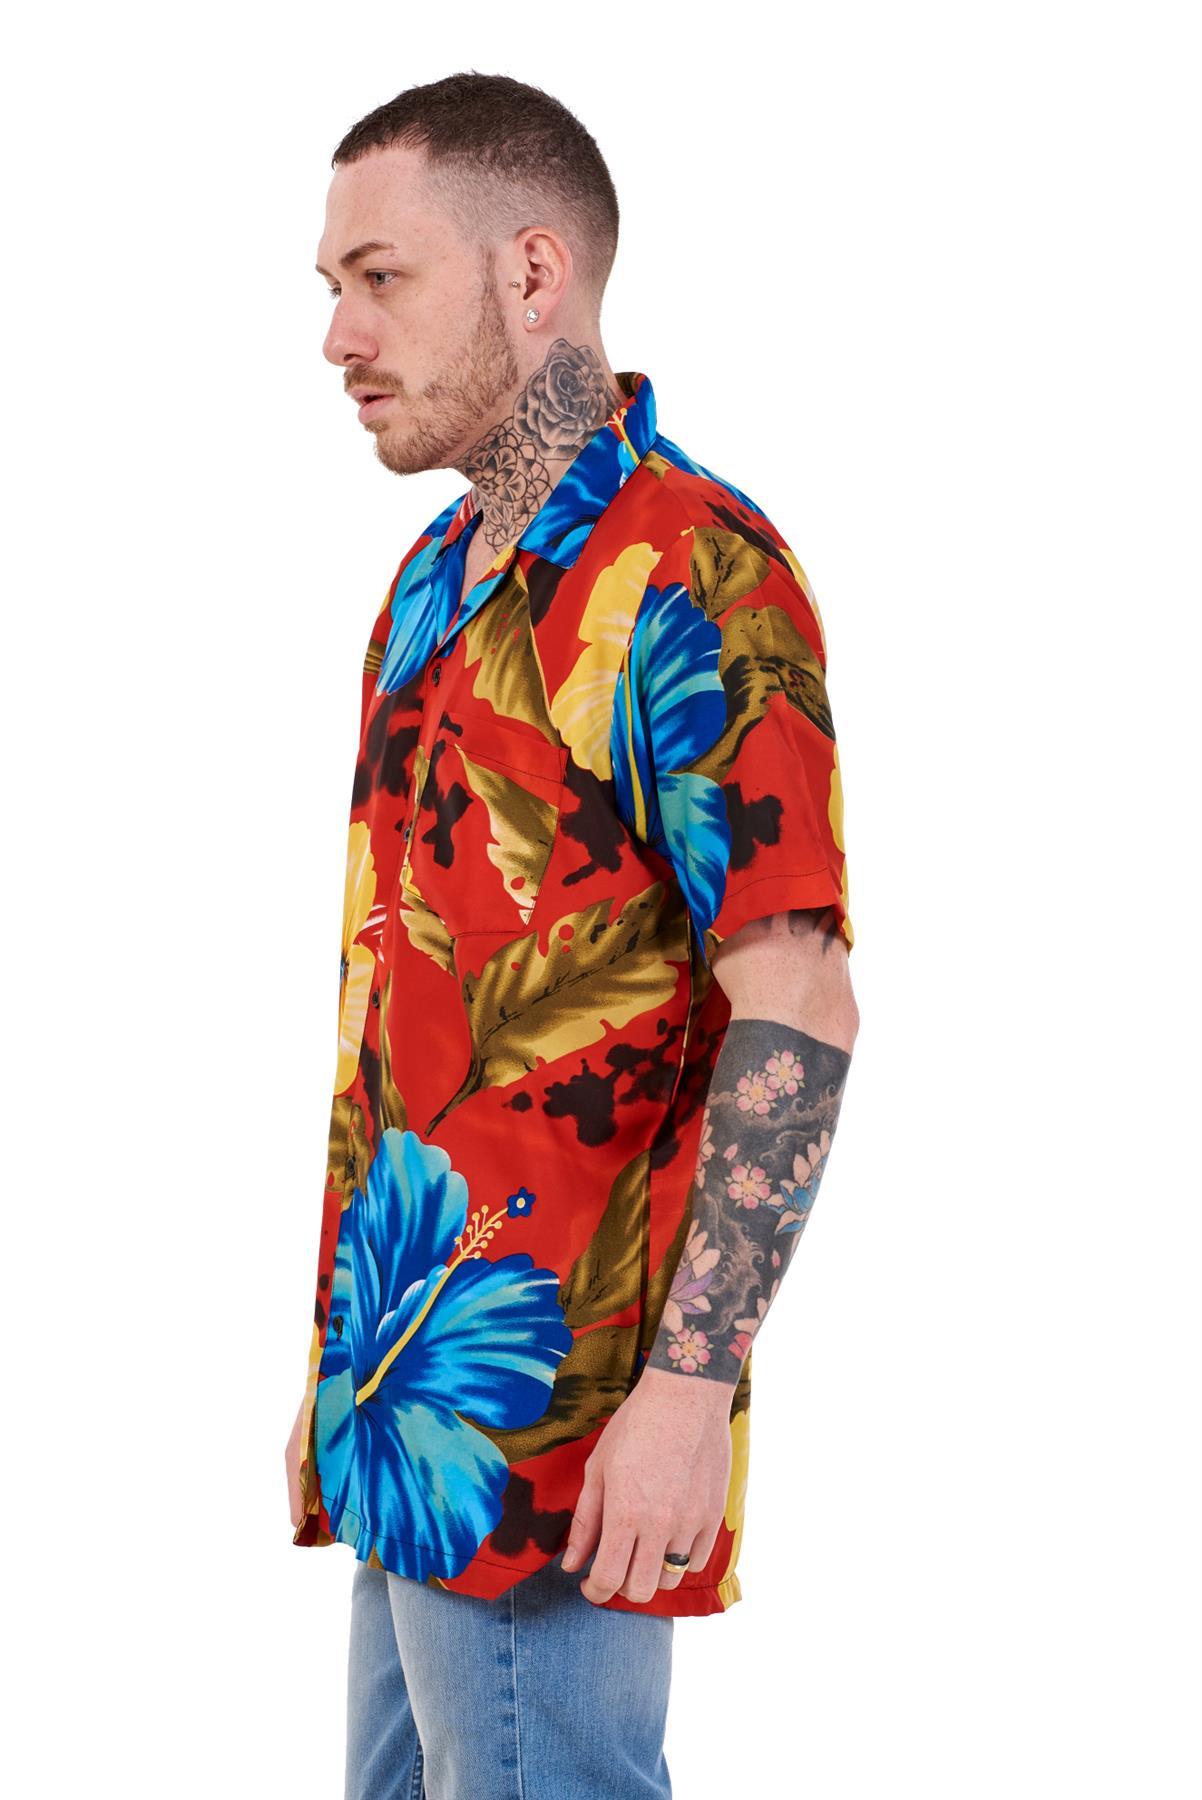 Mens-Hawaiian-Shirt-Multi-Colors-Print-Regular-Big-Size-Summer-Fancy-Dress-M-5XL thumbnail 36